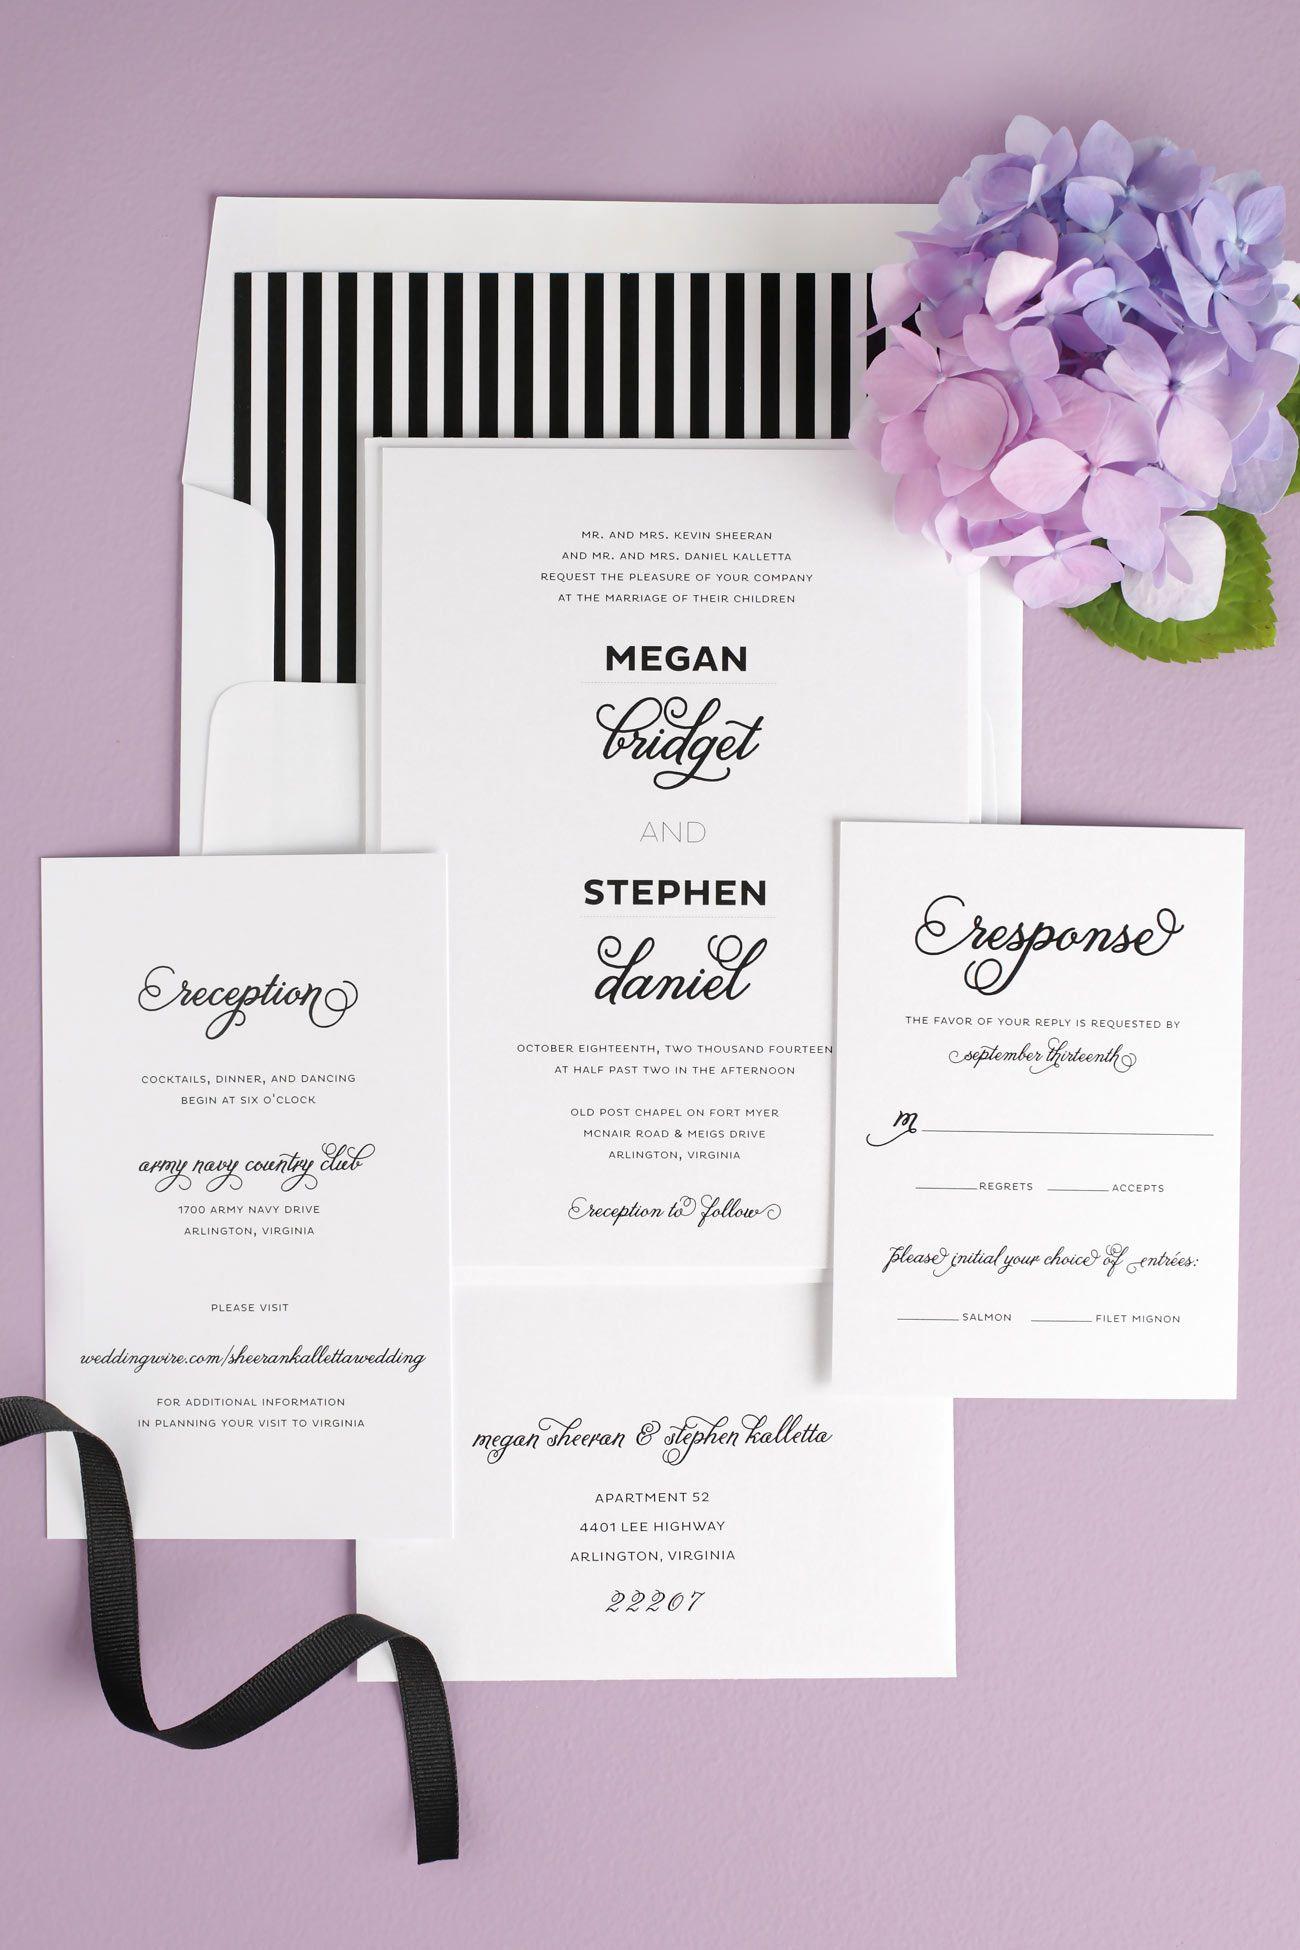 Modern and Whimsical Wedding Invitations   Weddings, Wedding and ...